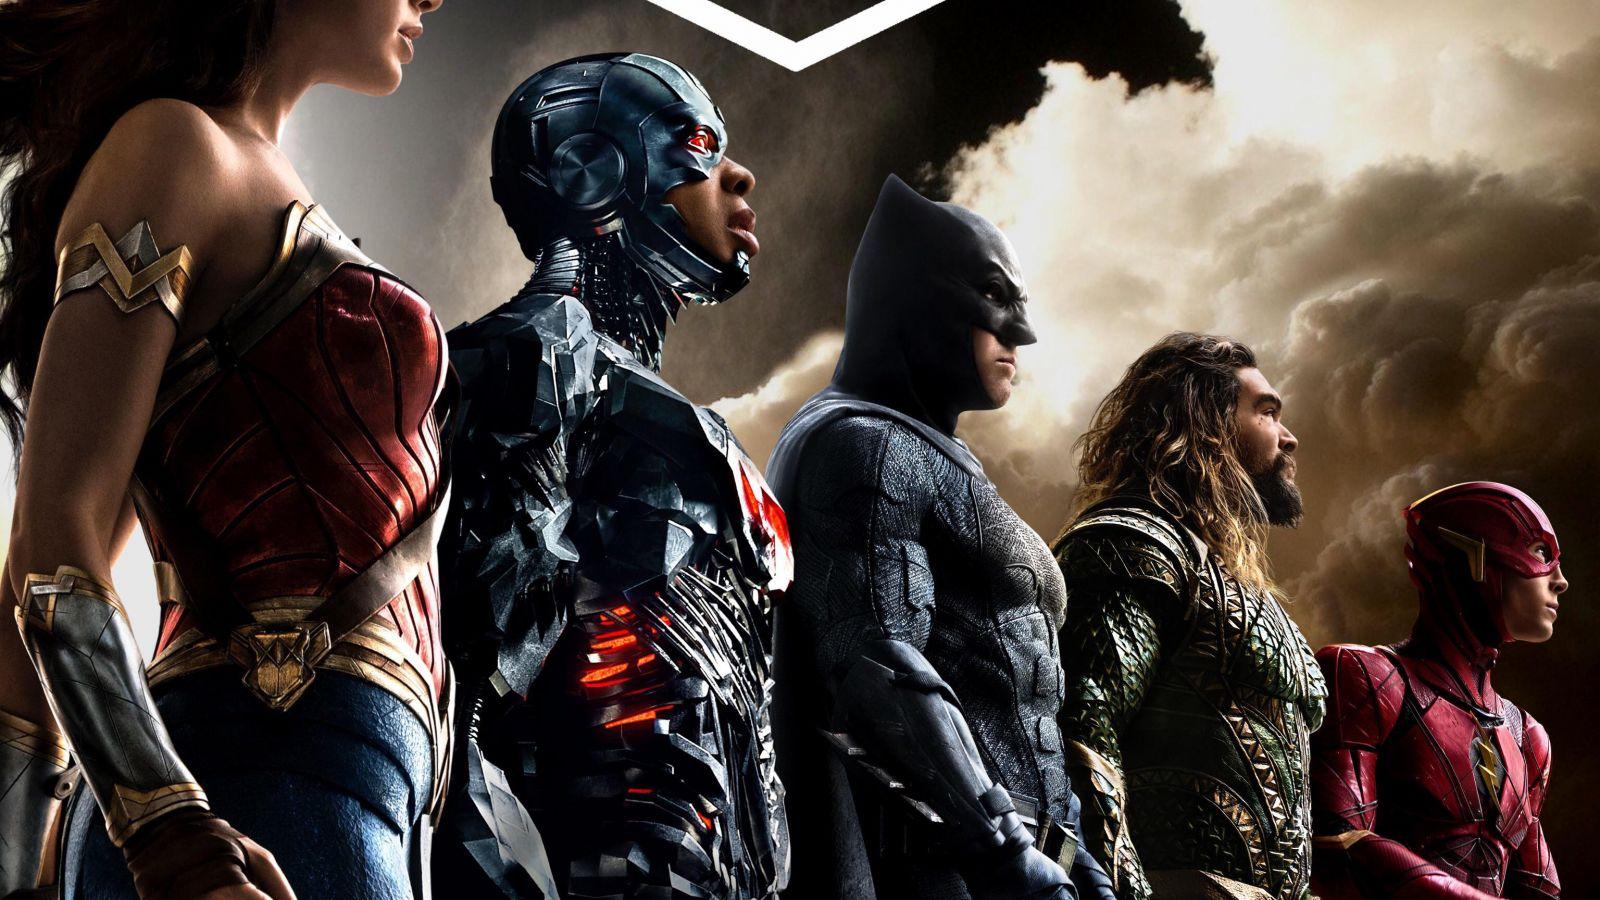 Justice League: Το καθηλωτικό τρέιλερ μας αποκαλύπτει τα μυστικά της νέας ταινίας του Zack Snyder [vid]